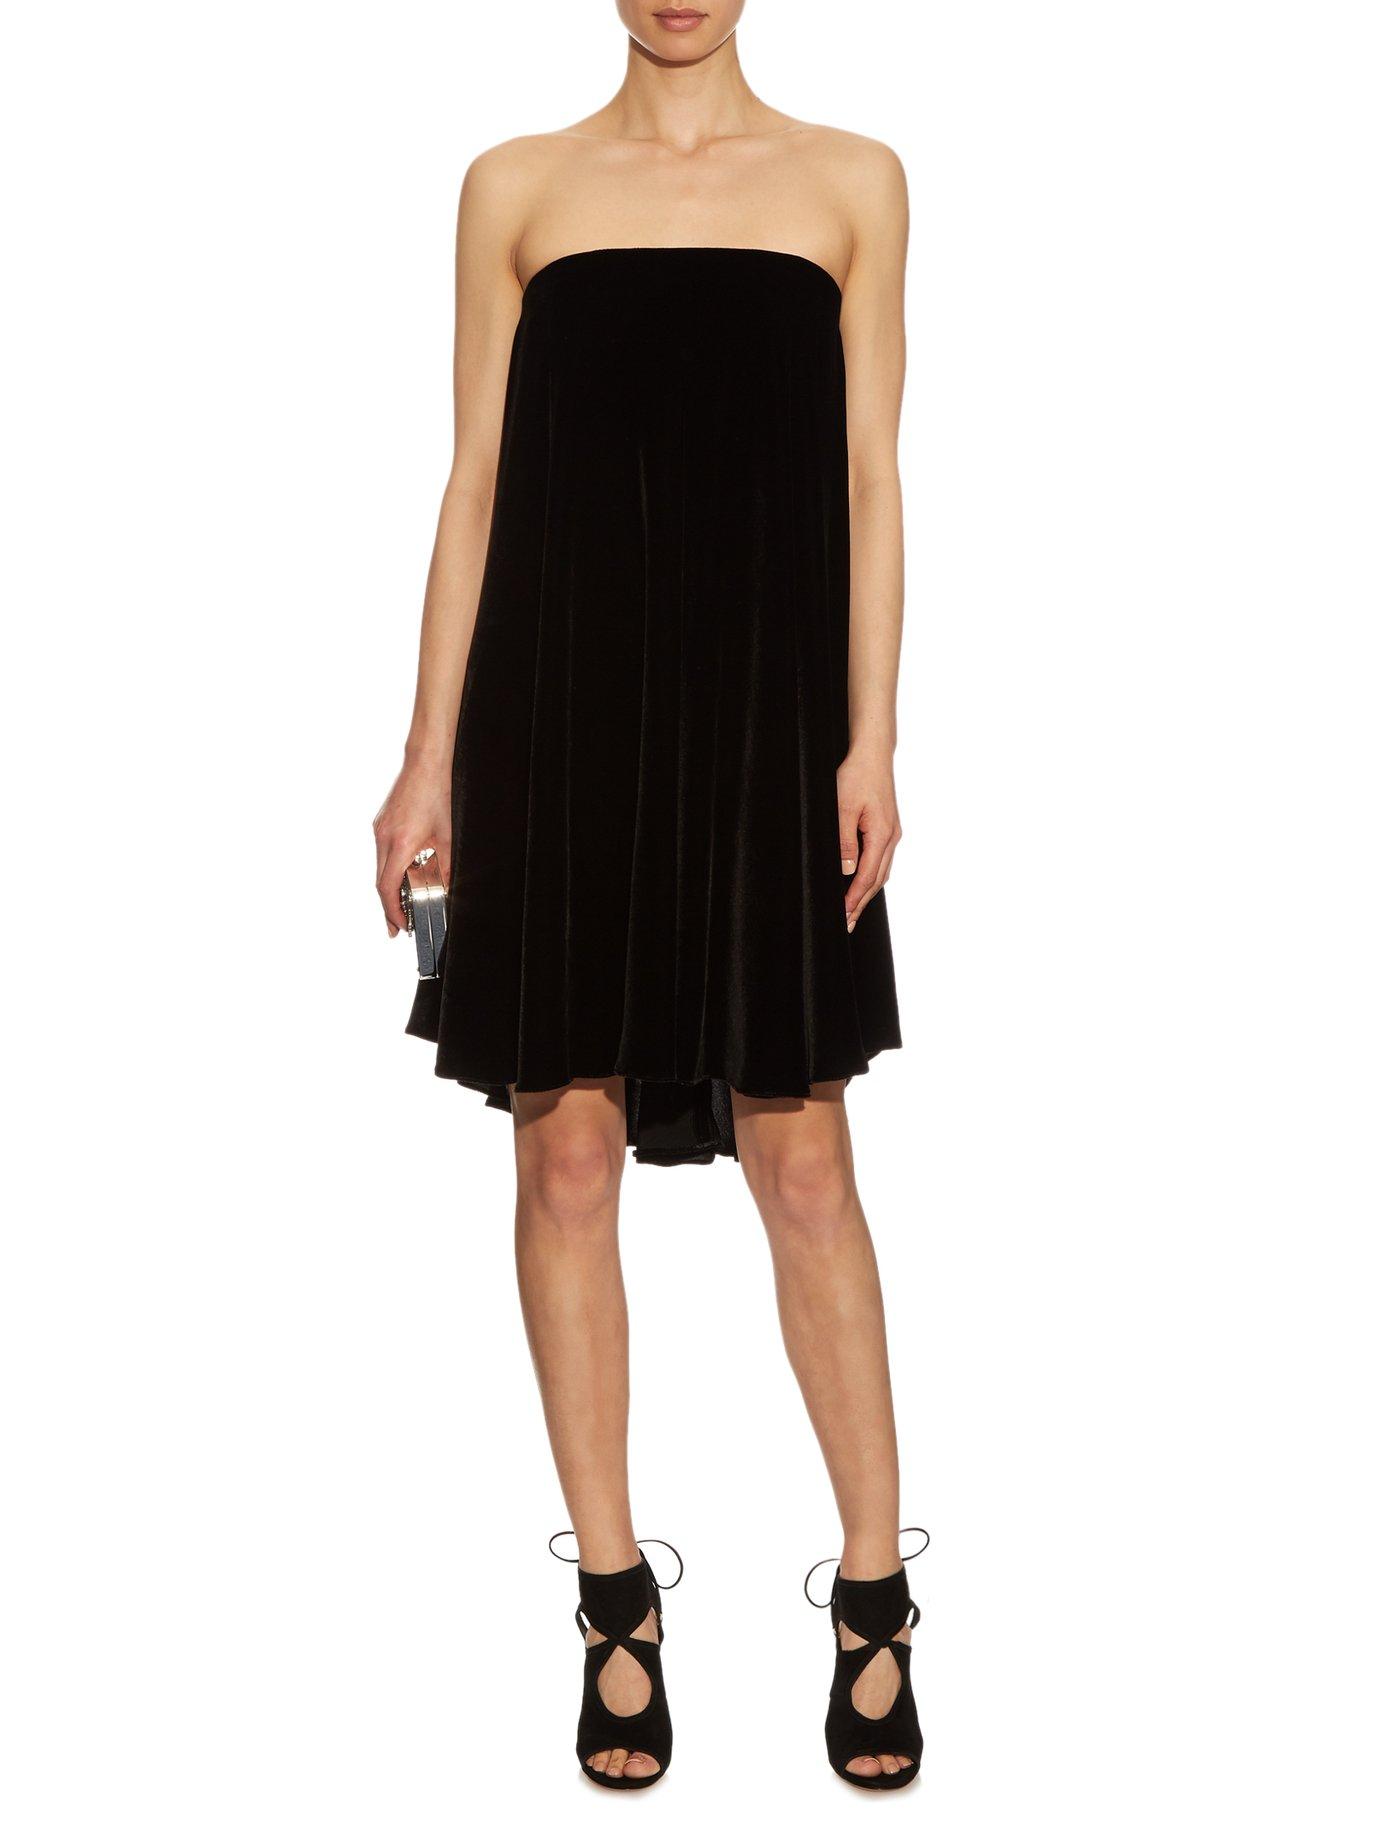 Baubo strapless velvet dress by La Mania